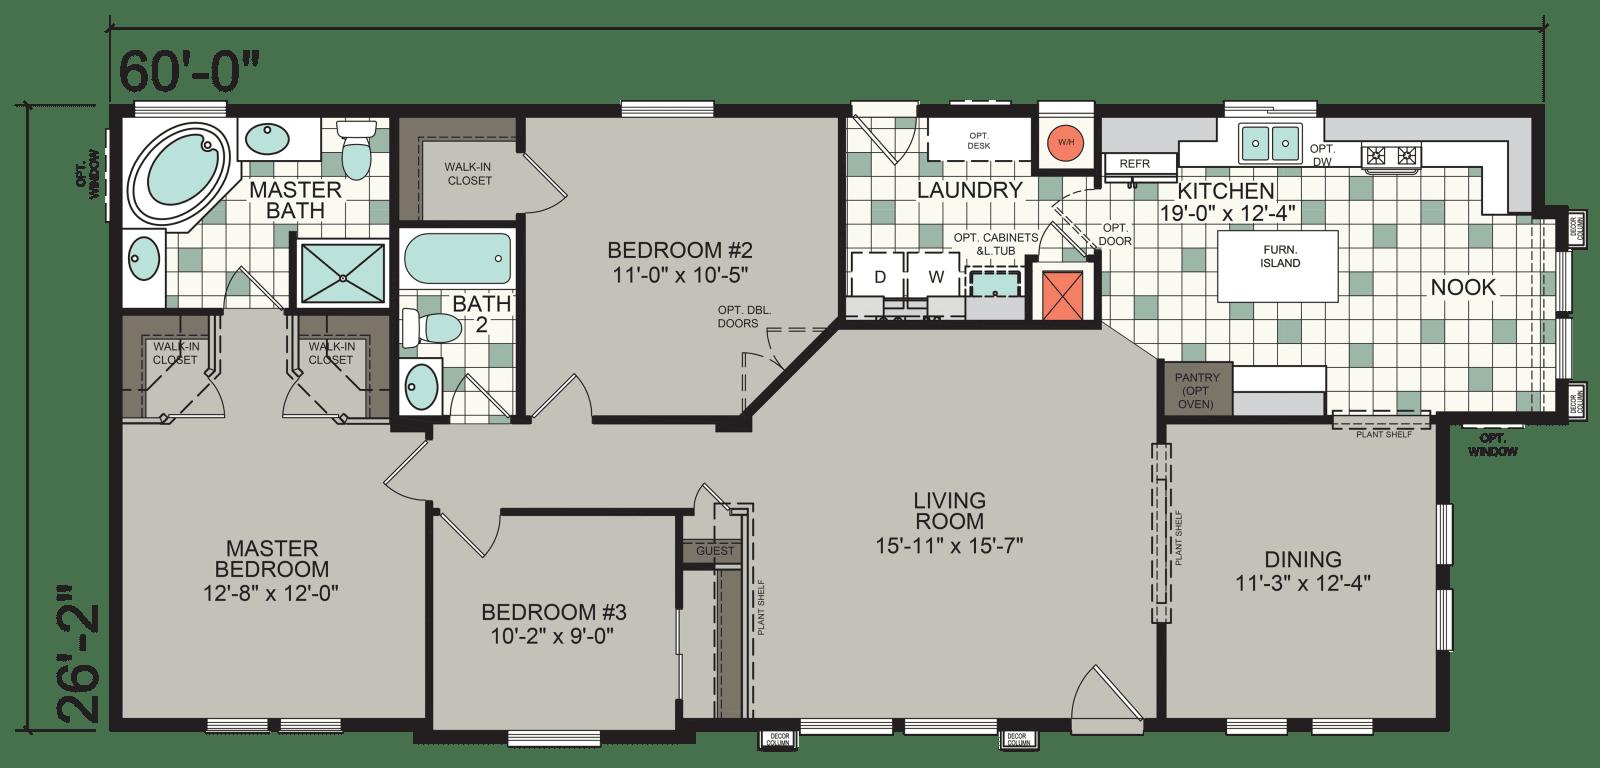 Craftsman Wc12 Silvercrest Champion Homes Floor Plans House Floor Plans Manufactured Homes Floor Plans